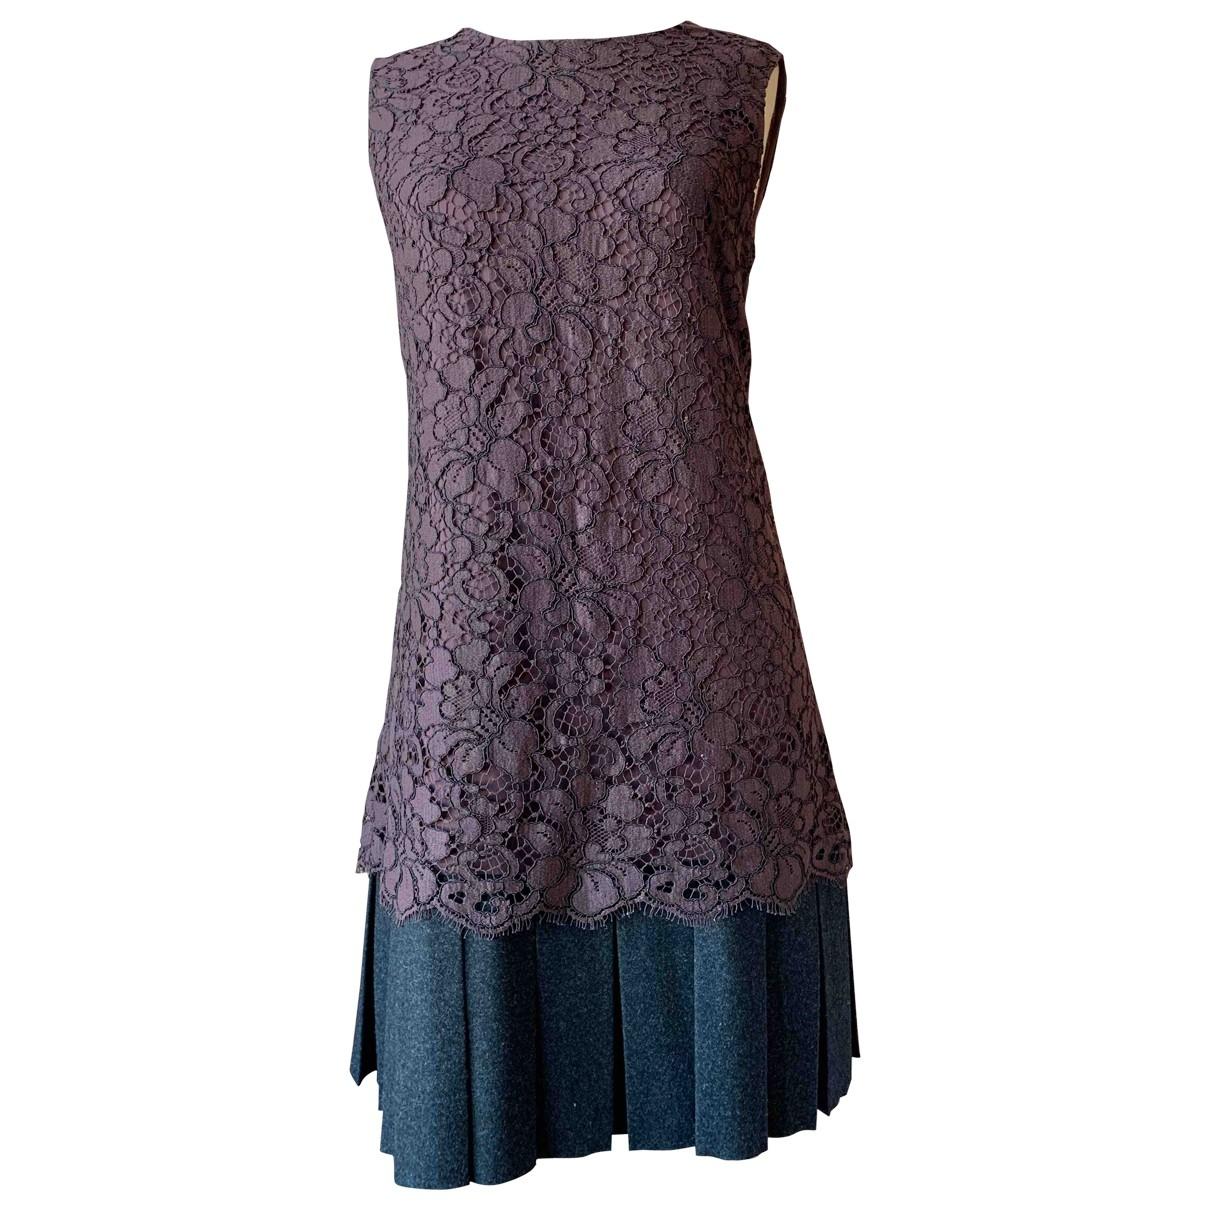 Dolce & Gabbana \N Burgundy Lace dress for Women 44 IT